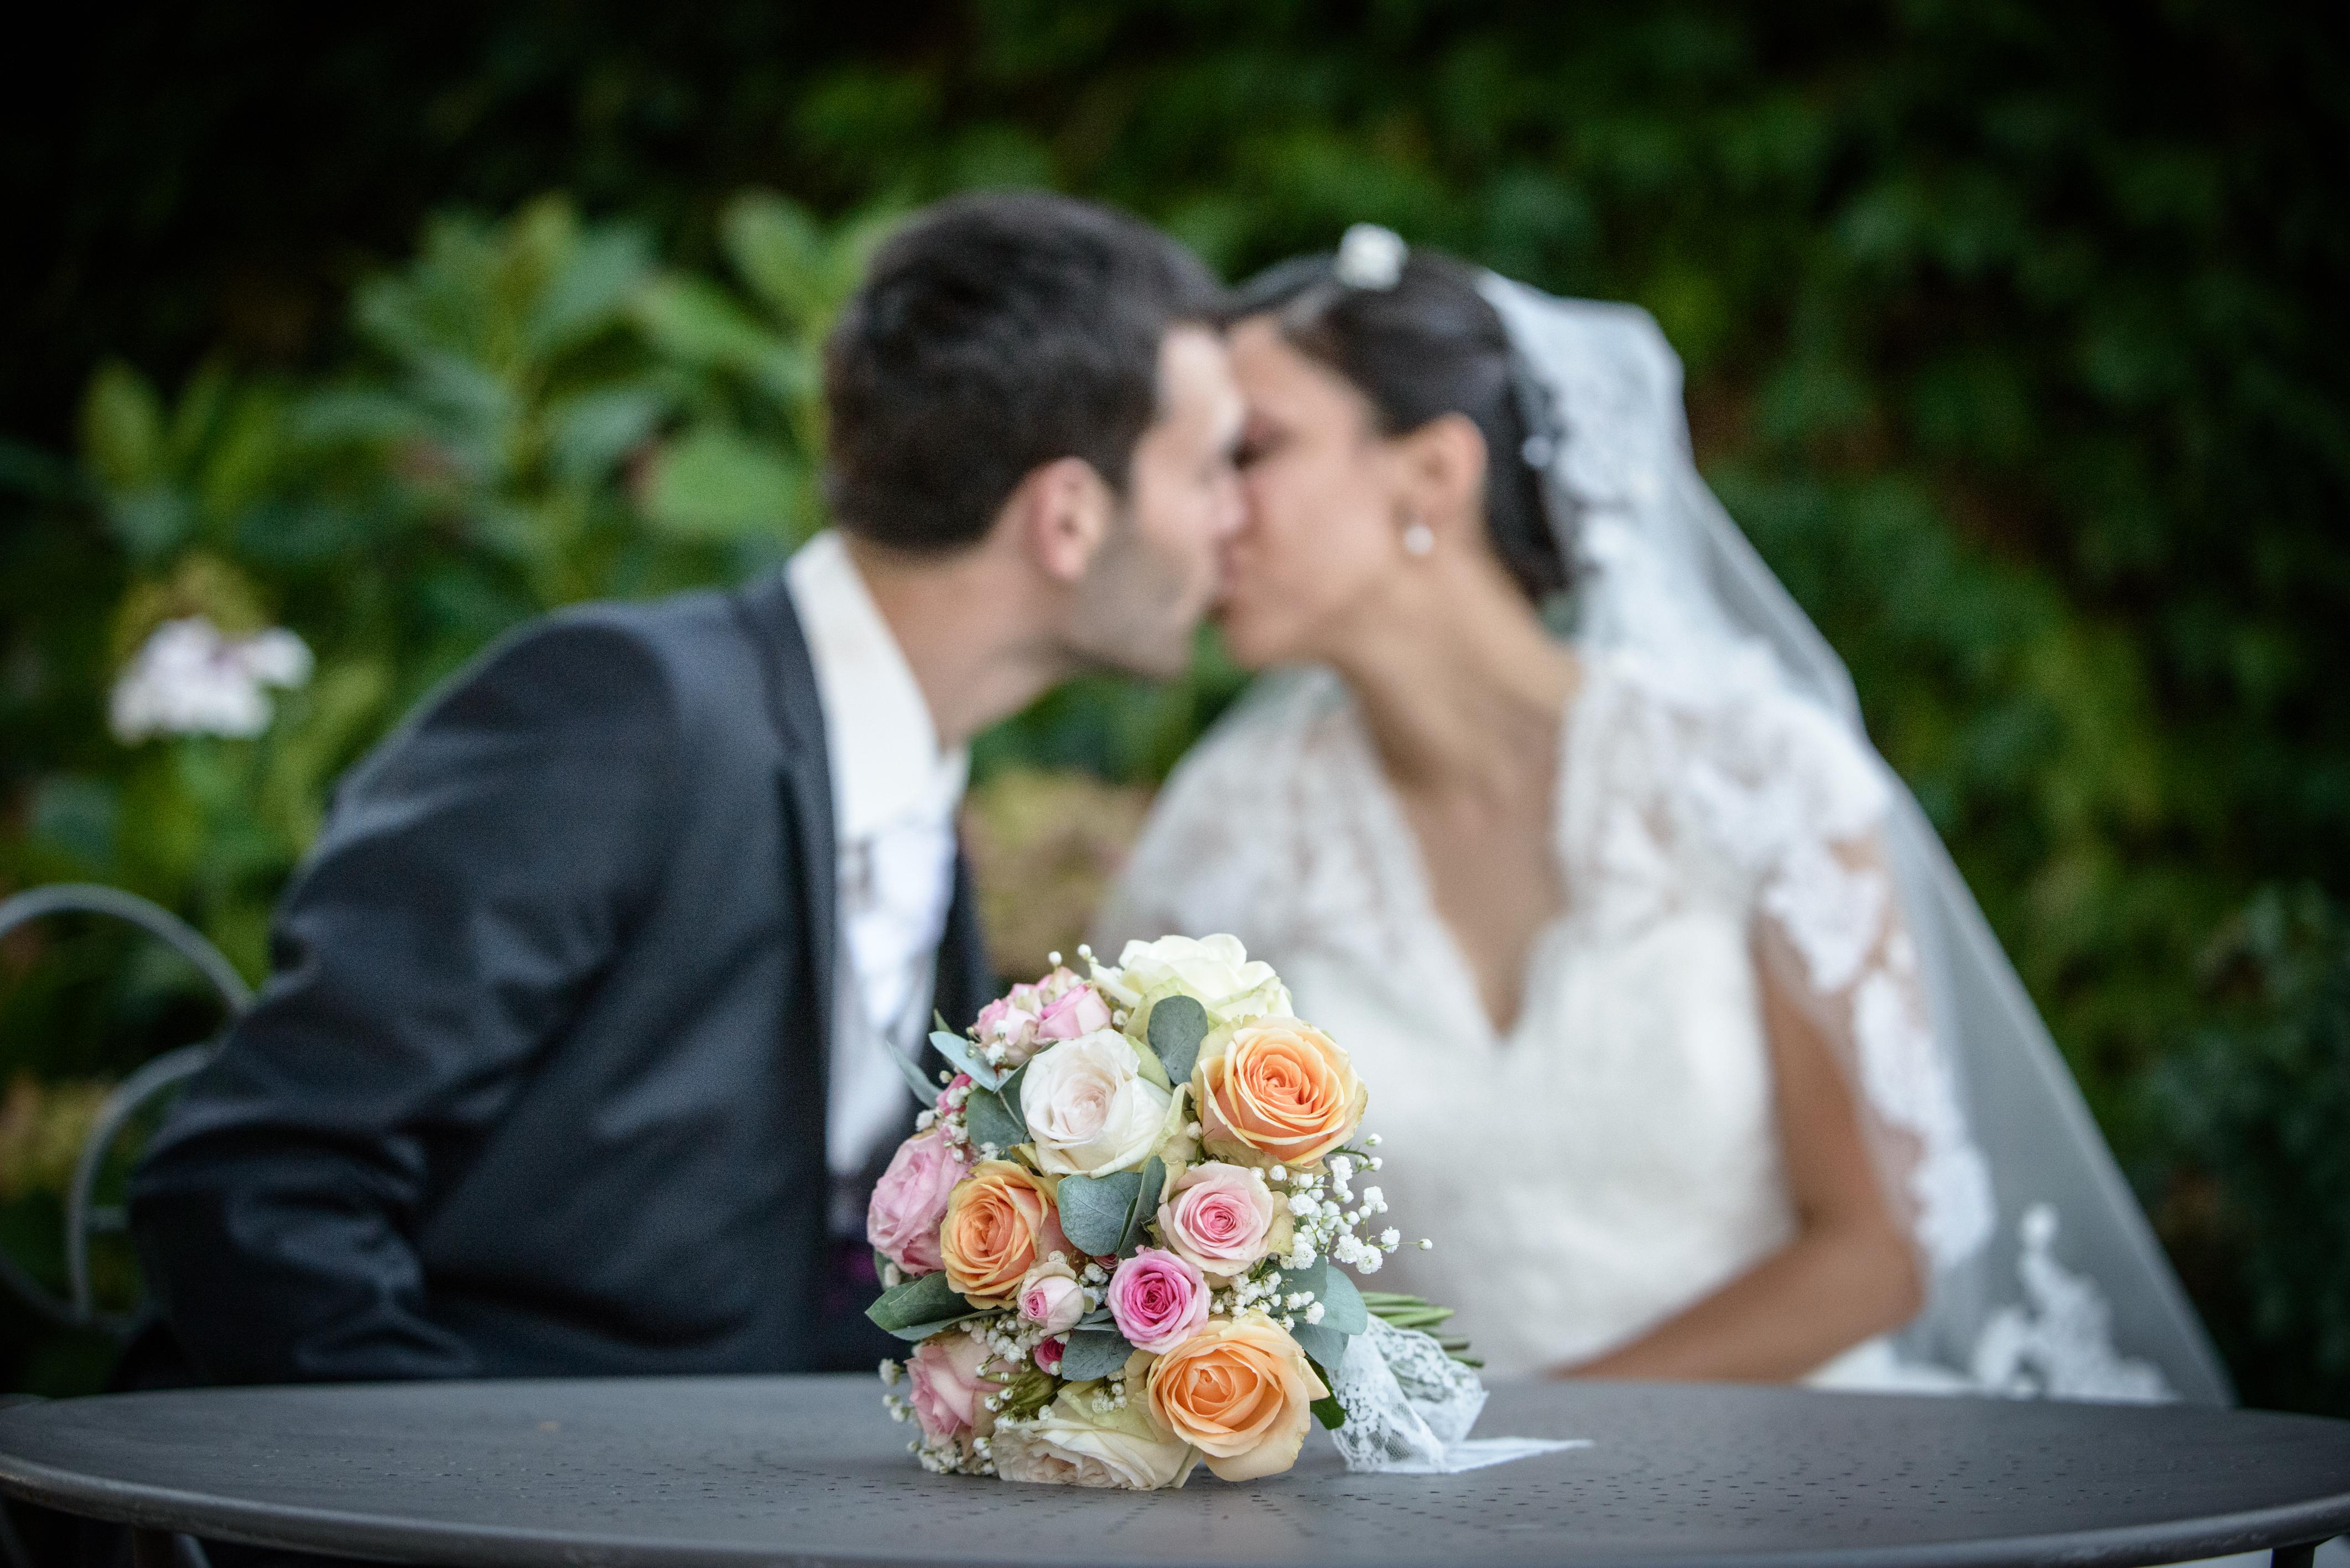 photographe bisou mariage